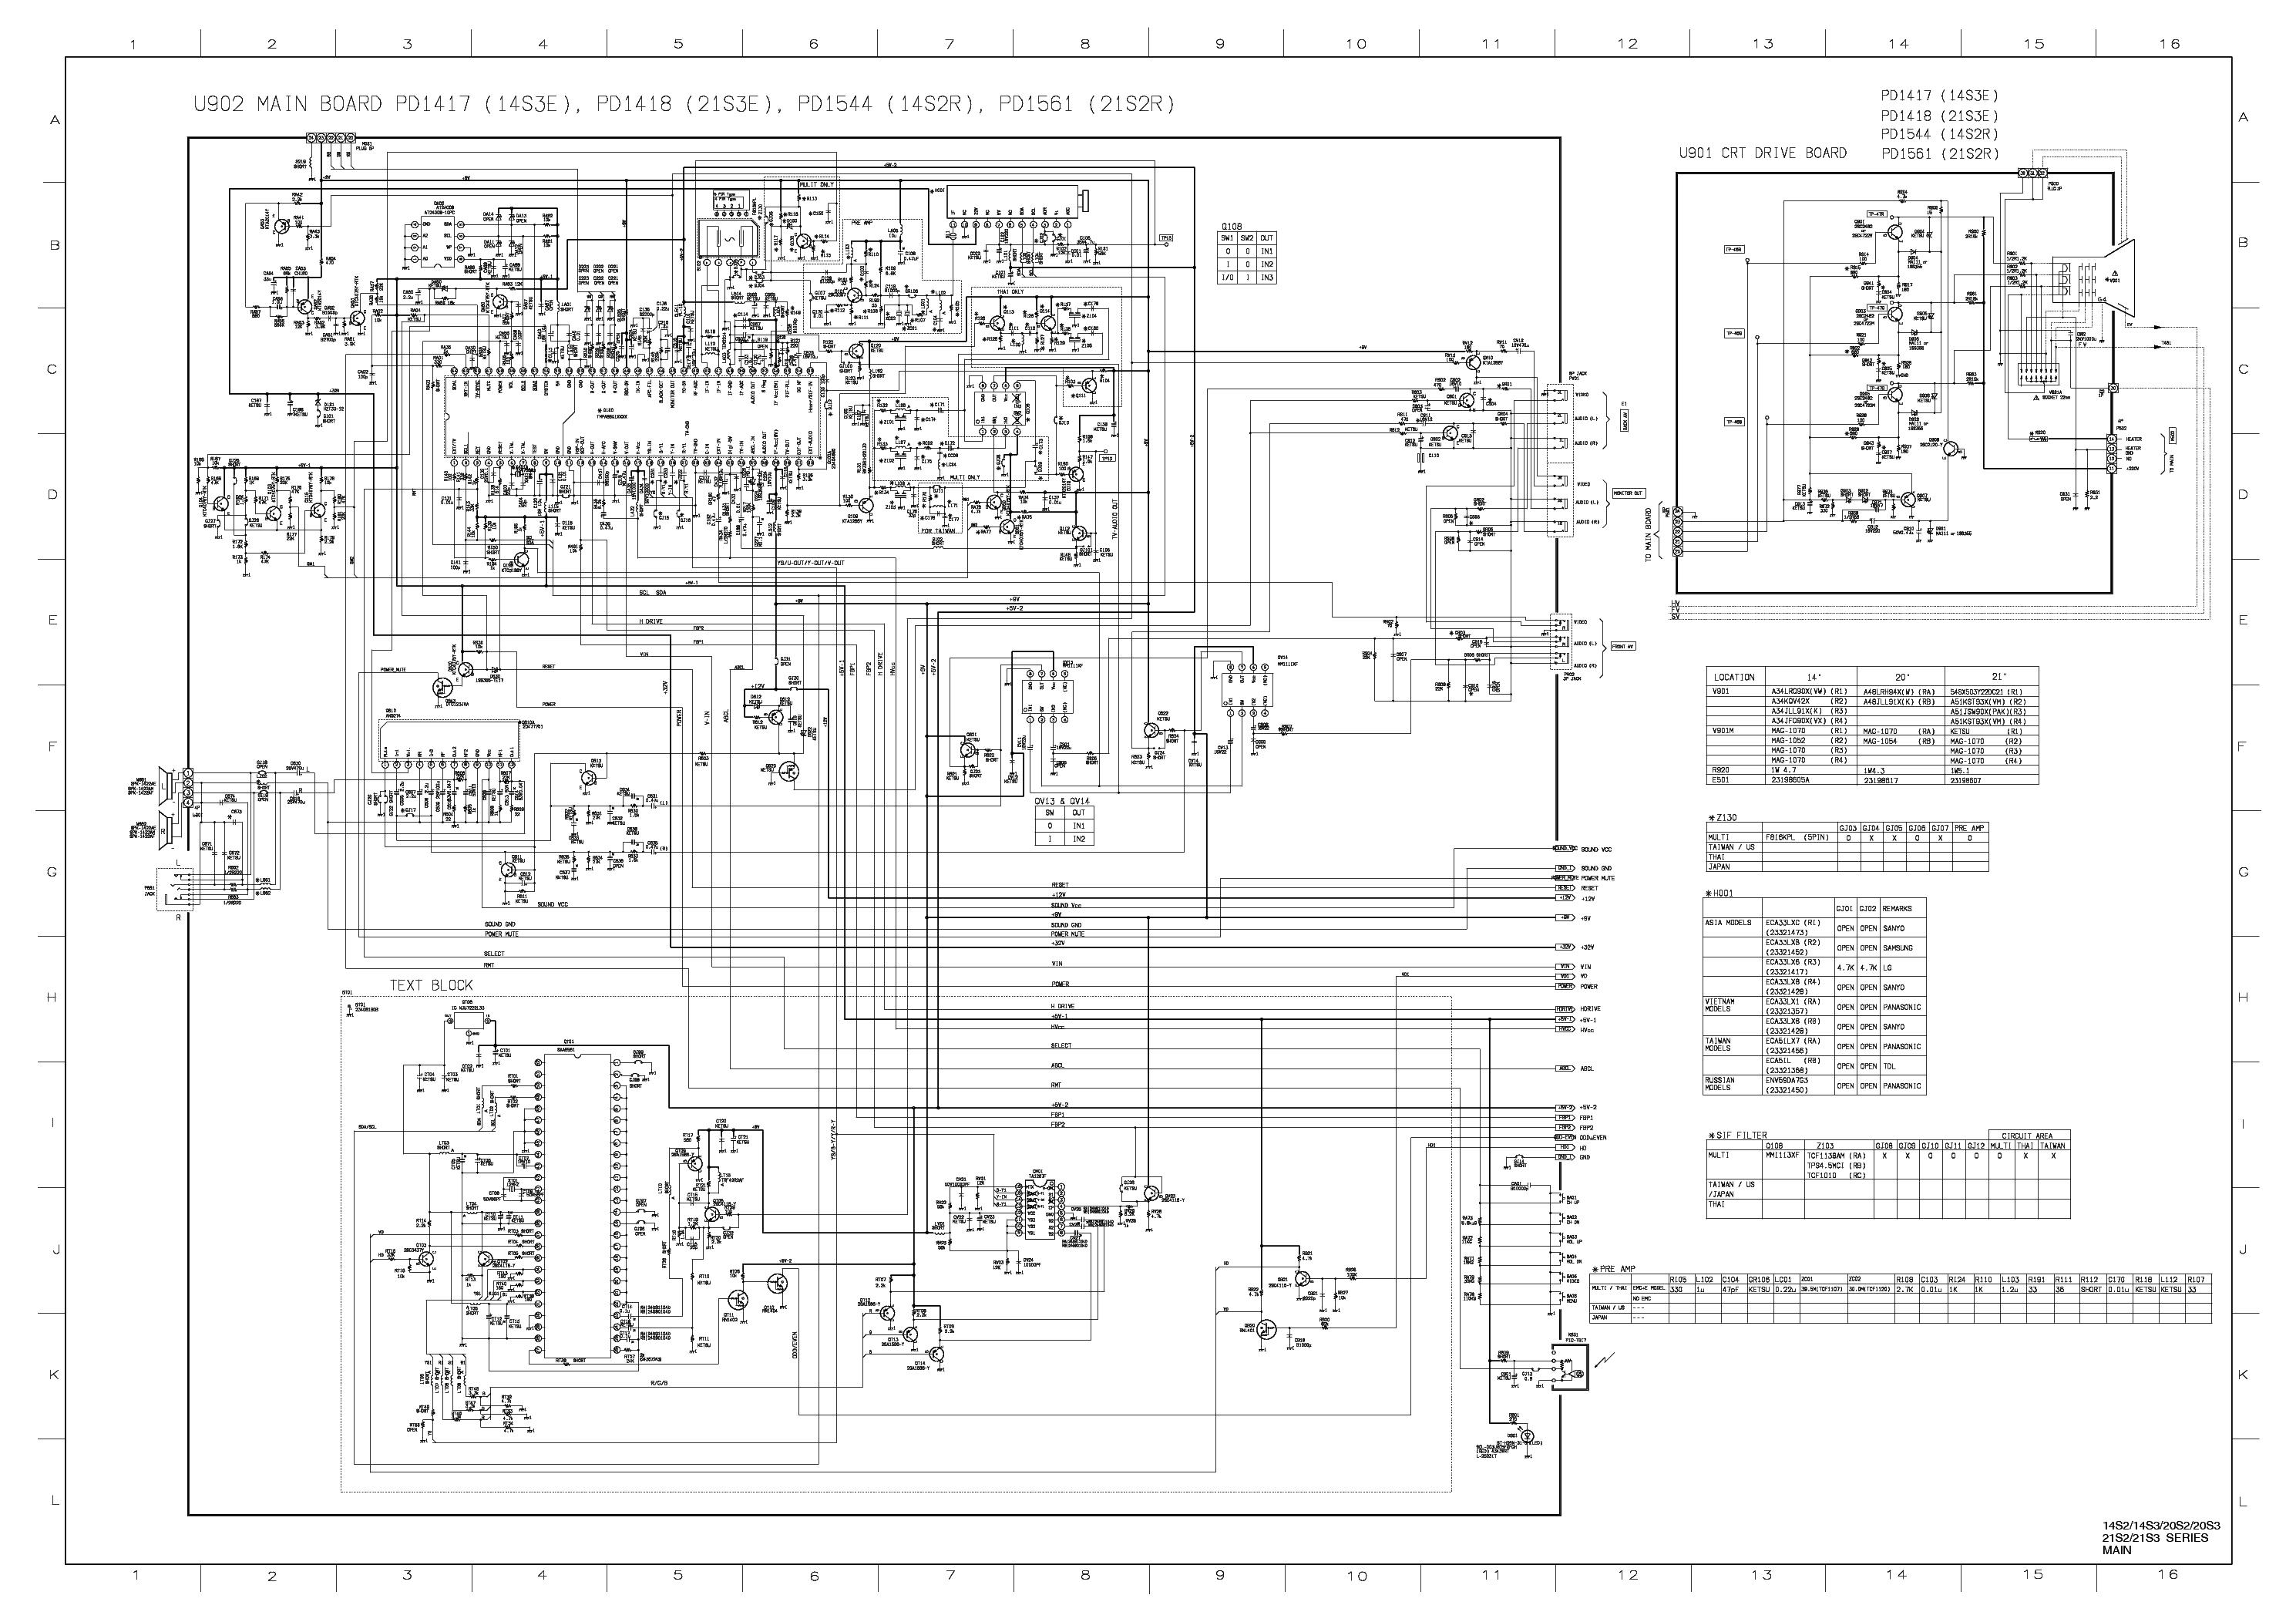 Toshiba G7 Wiring Diagram Honda Goldwing Engine Diagram For Wiring Diagram Schematics